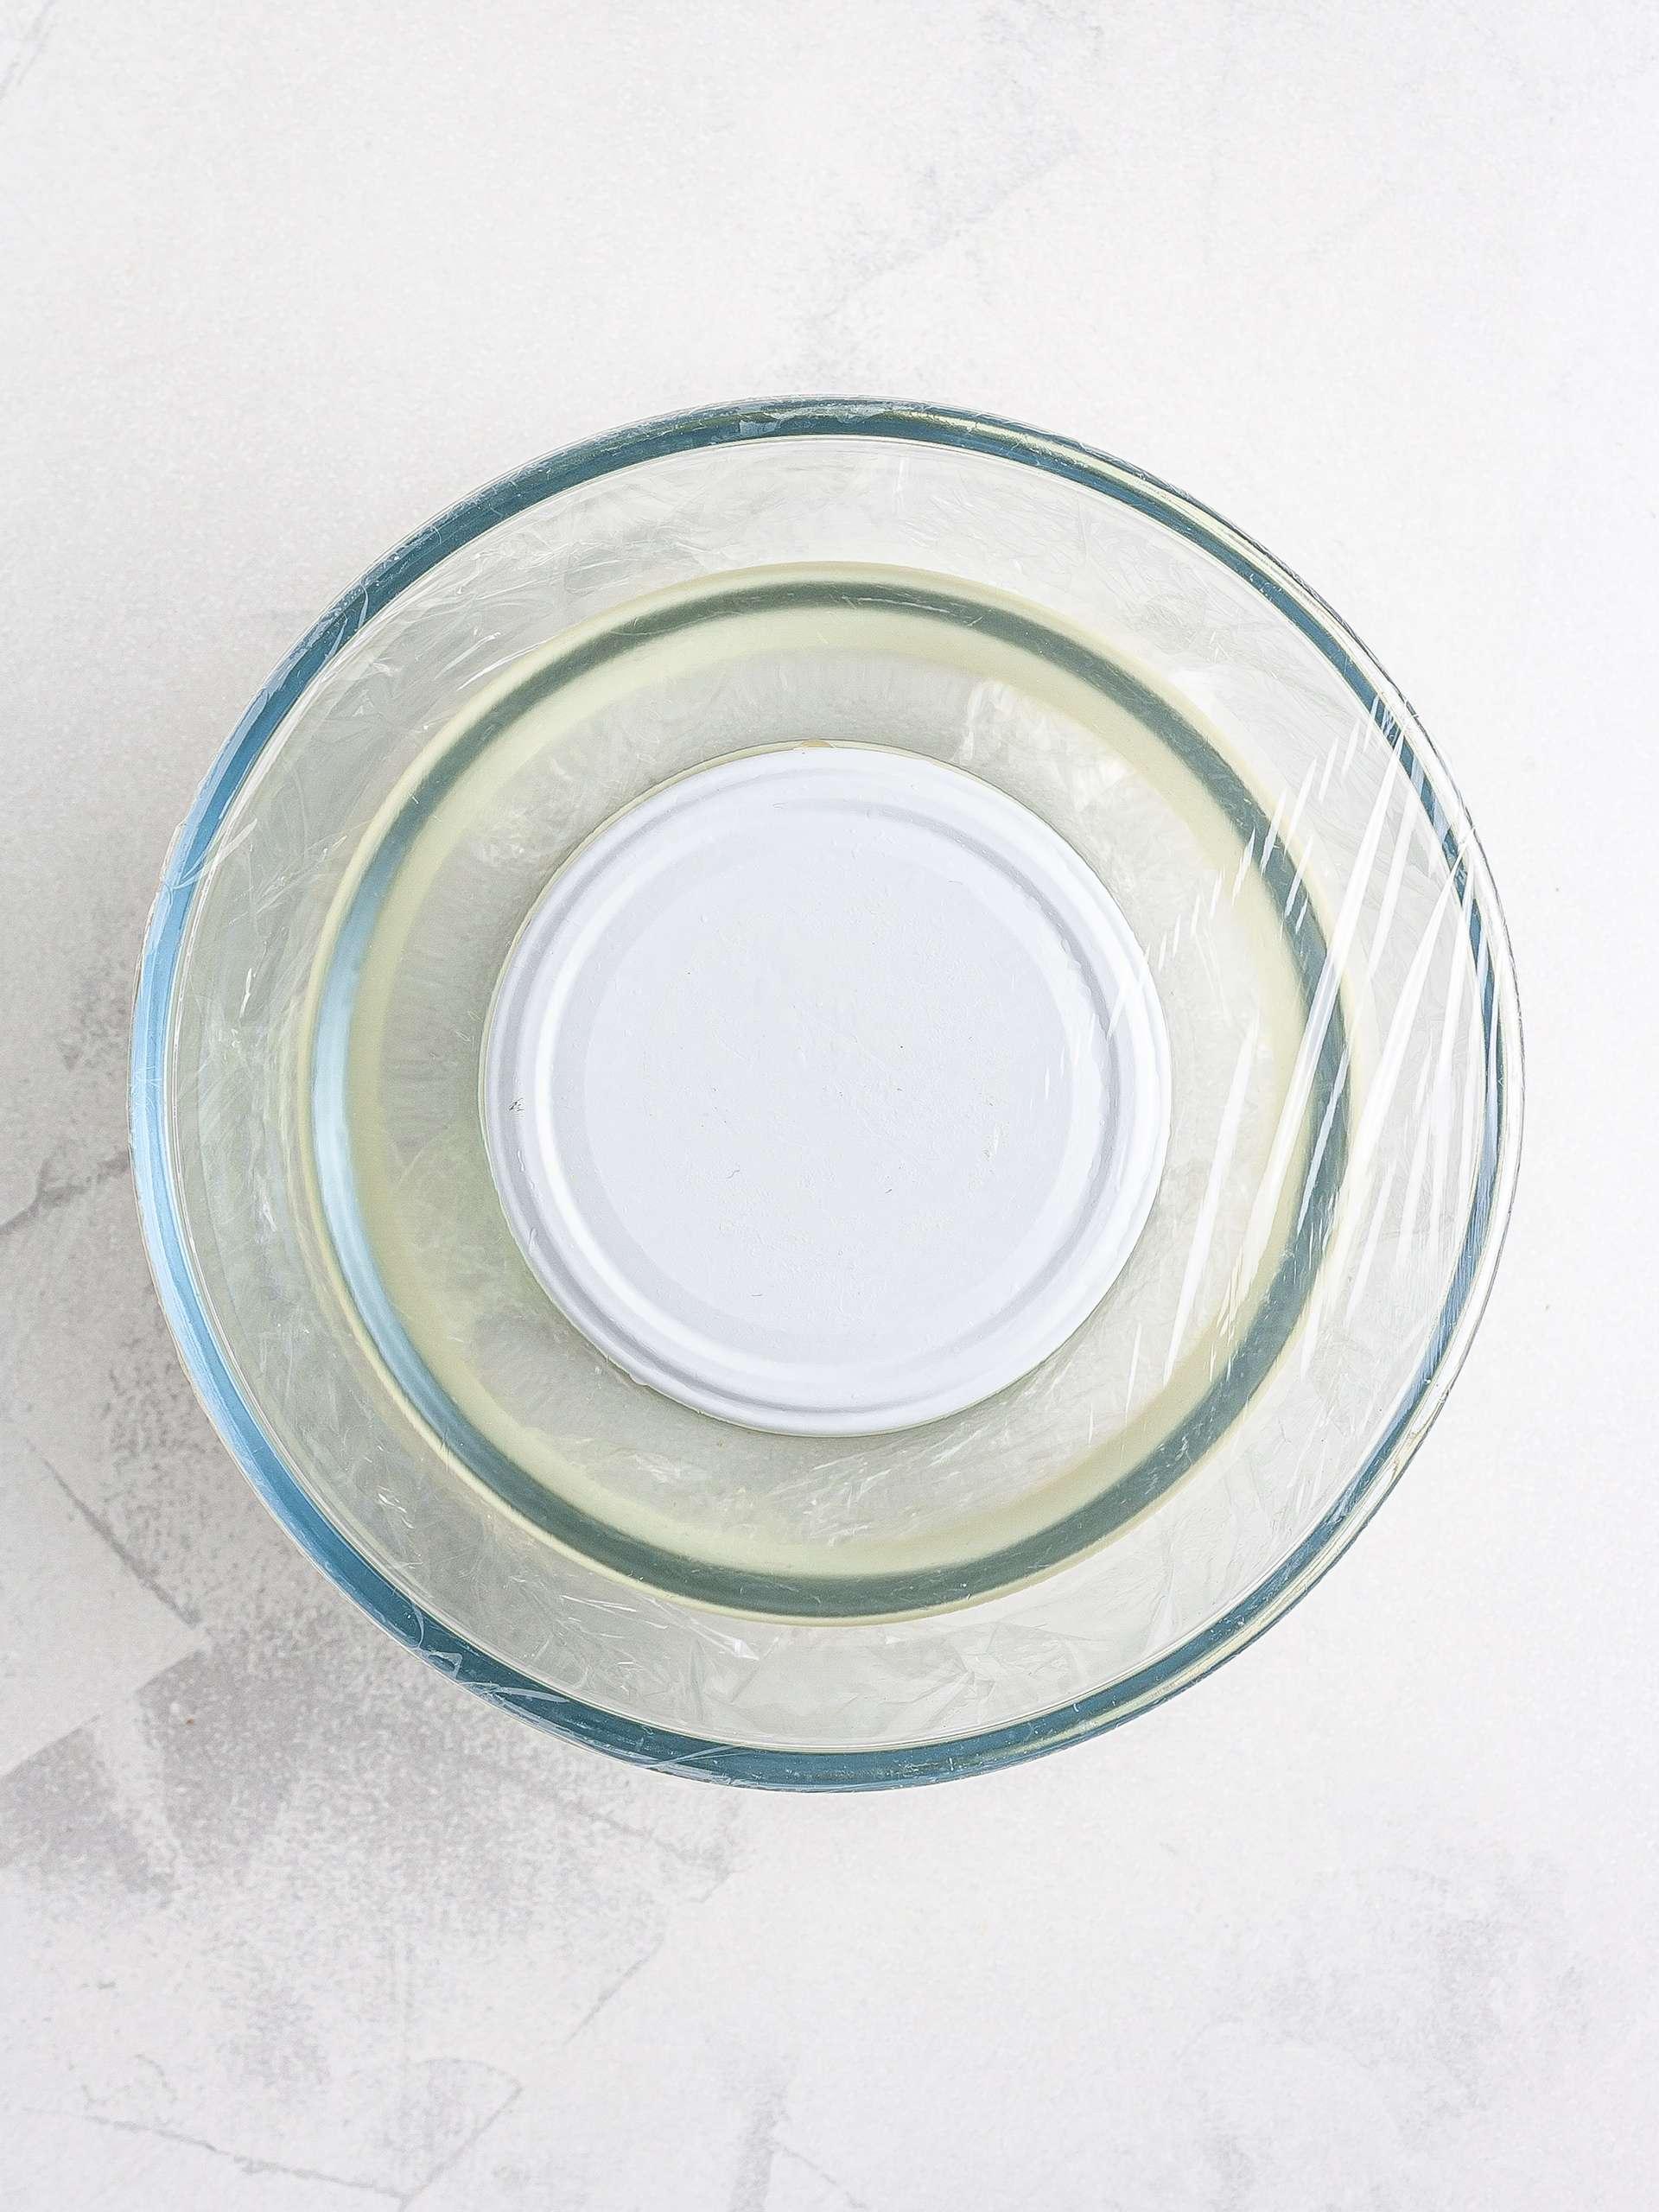 Oat milk yogurt incubated in a water bath